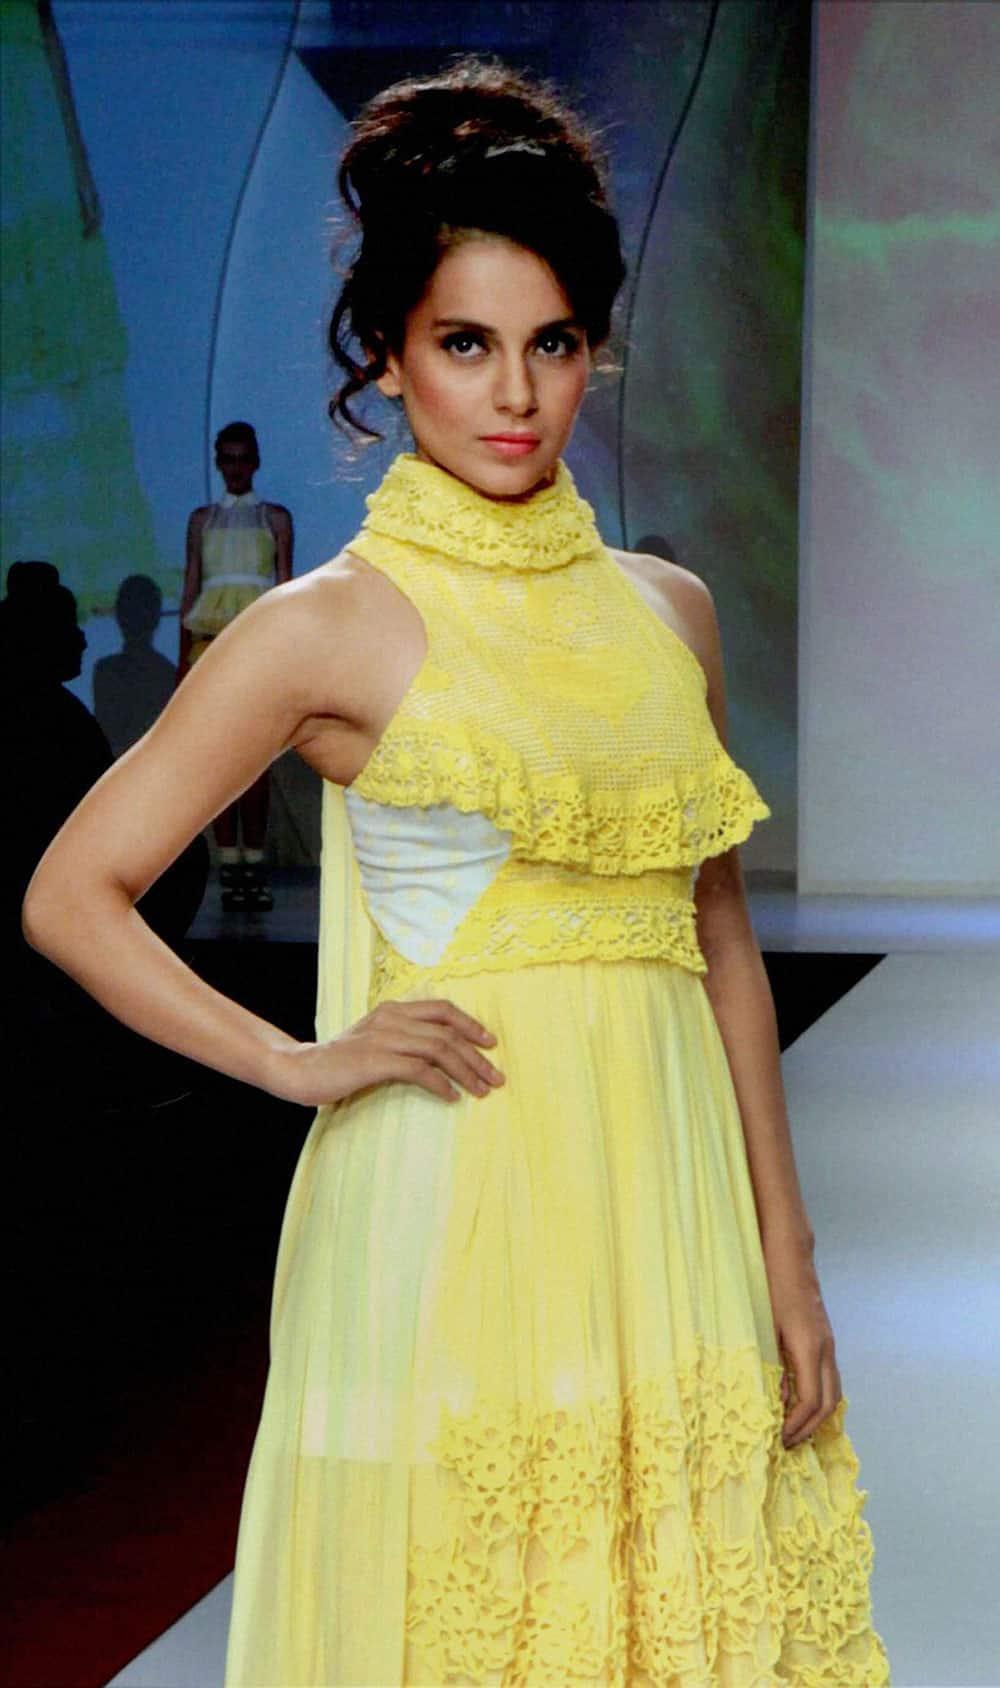 Bollywood Actress Kangana Ranaut walks the ramp at the Signature International Fashion Weekend 2013 in Mumbai.